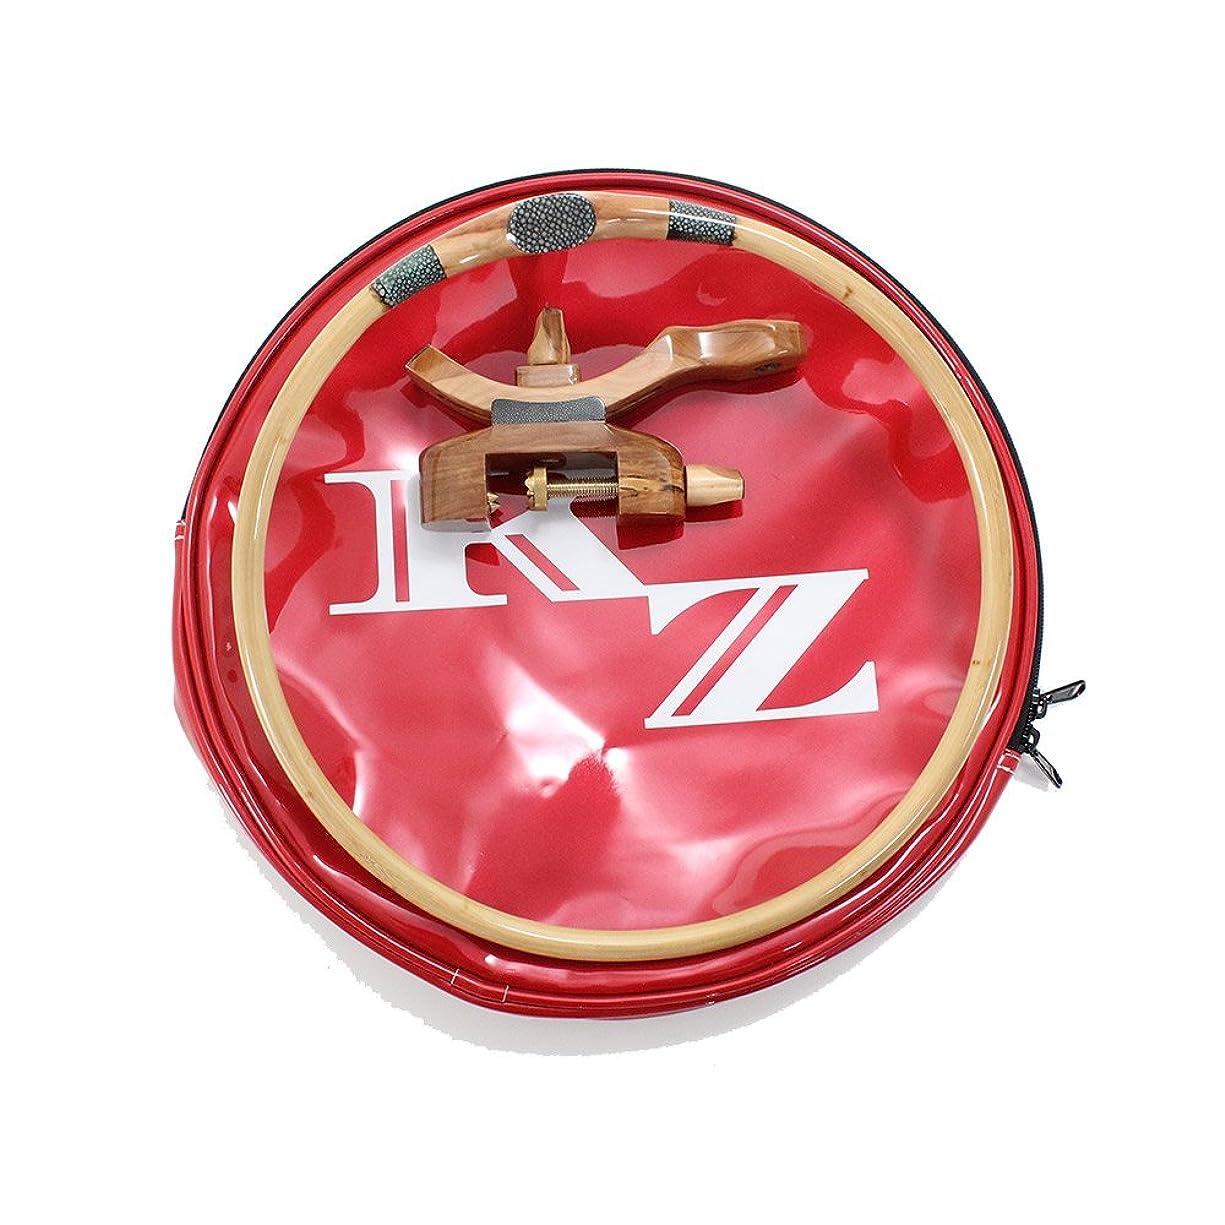 予知配分型風斬 玉置ケース 赤/白 + 風斬 銘木 玉置セット (50250-50280)